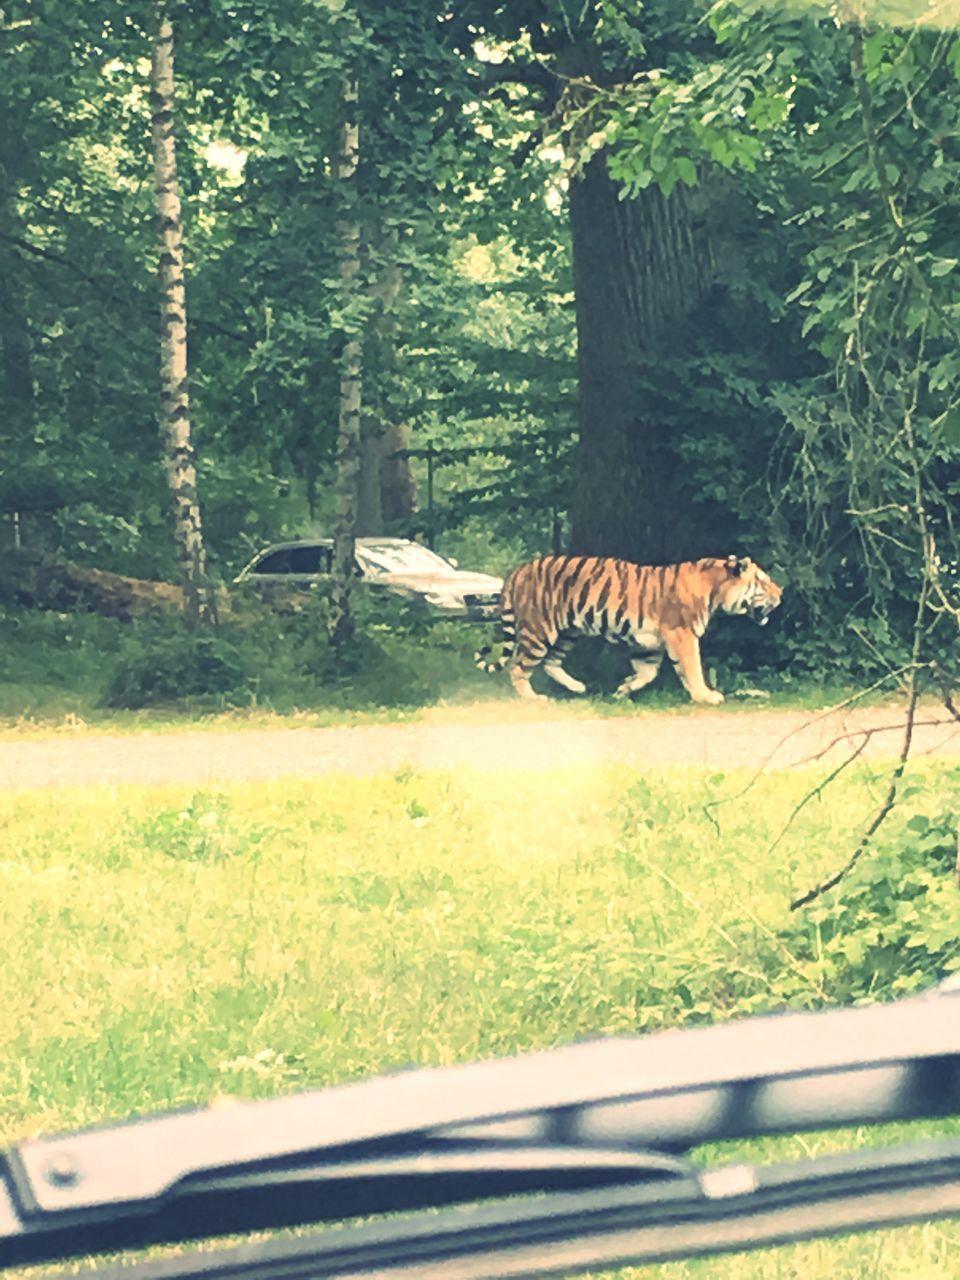 one animal, animals in the wild, animal themes, day, animal wildlife, nature, mammal, wildlife, green color, grass, tree, safari animals, animal markings, no people, plant, feline, outdoors, zebra, leopard